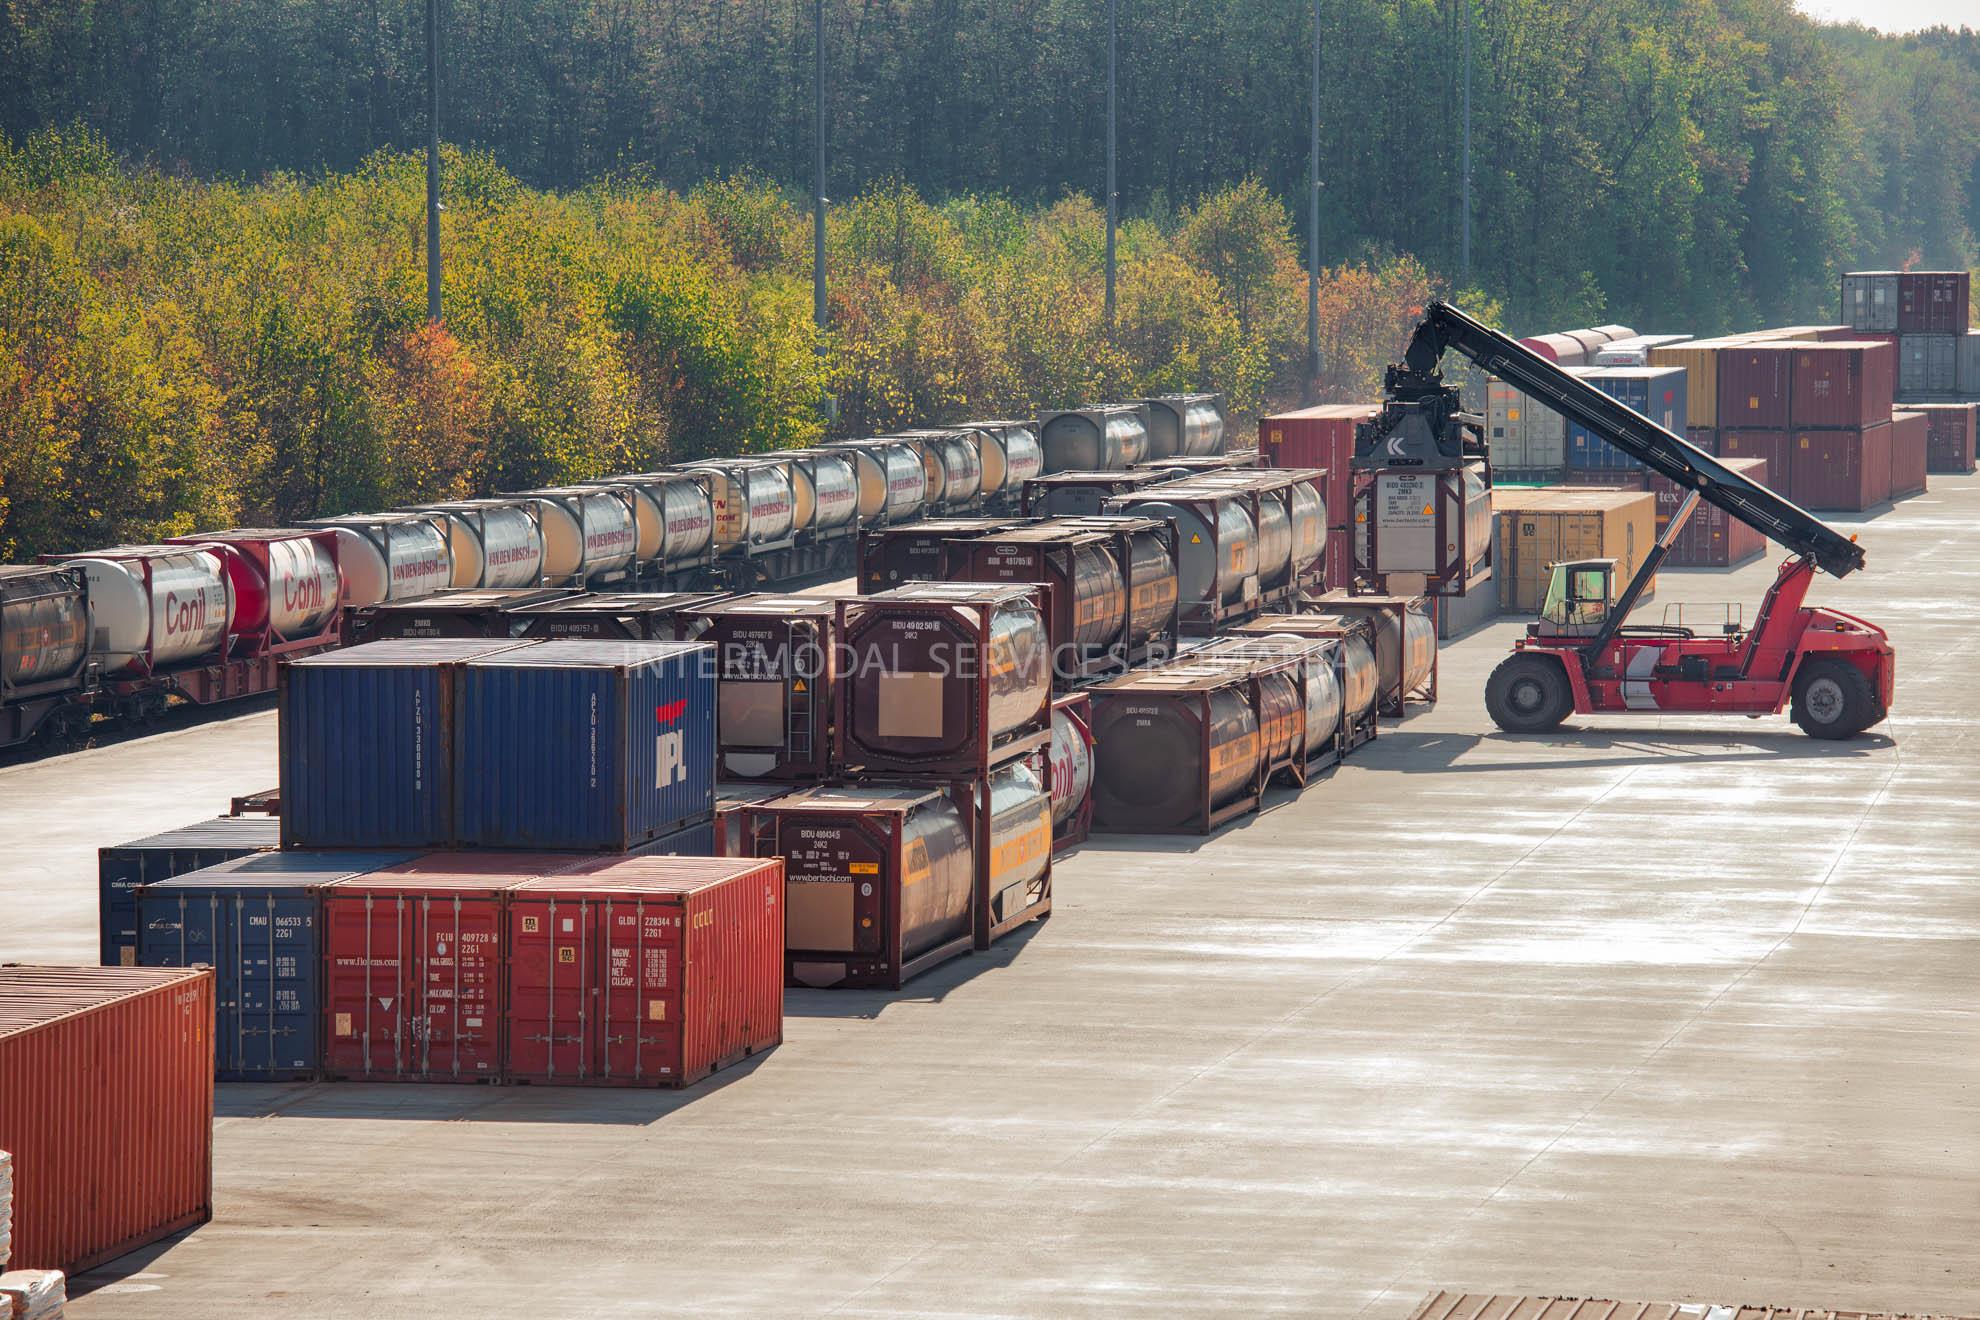 Intermodal-Services-Ploiesti-web-16